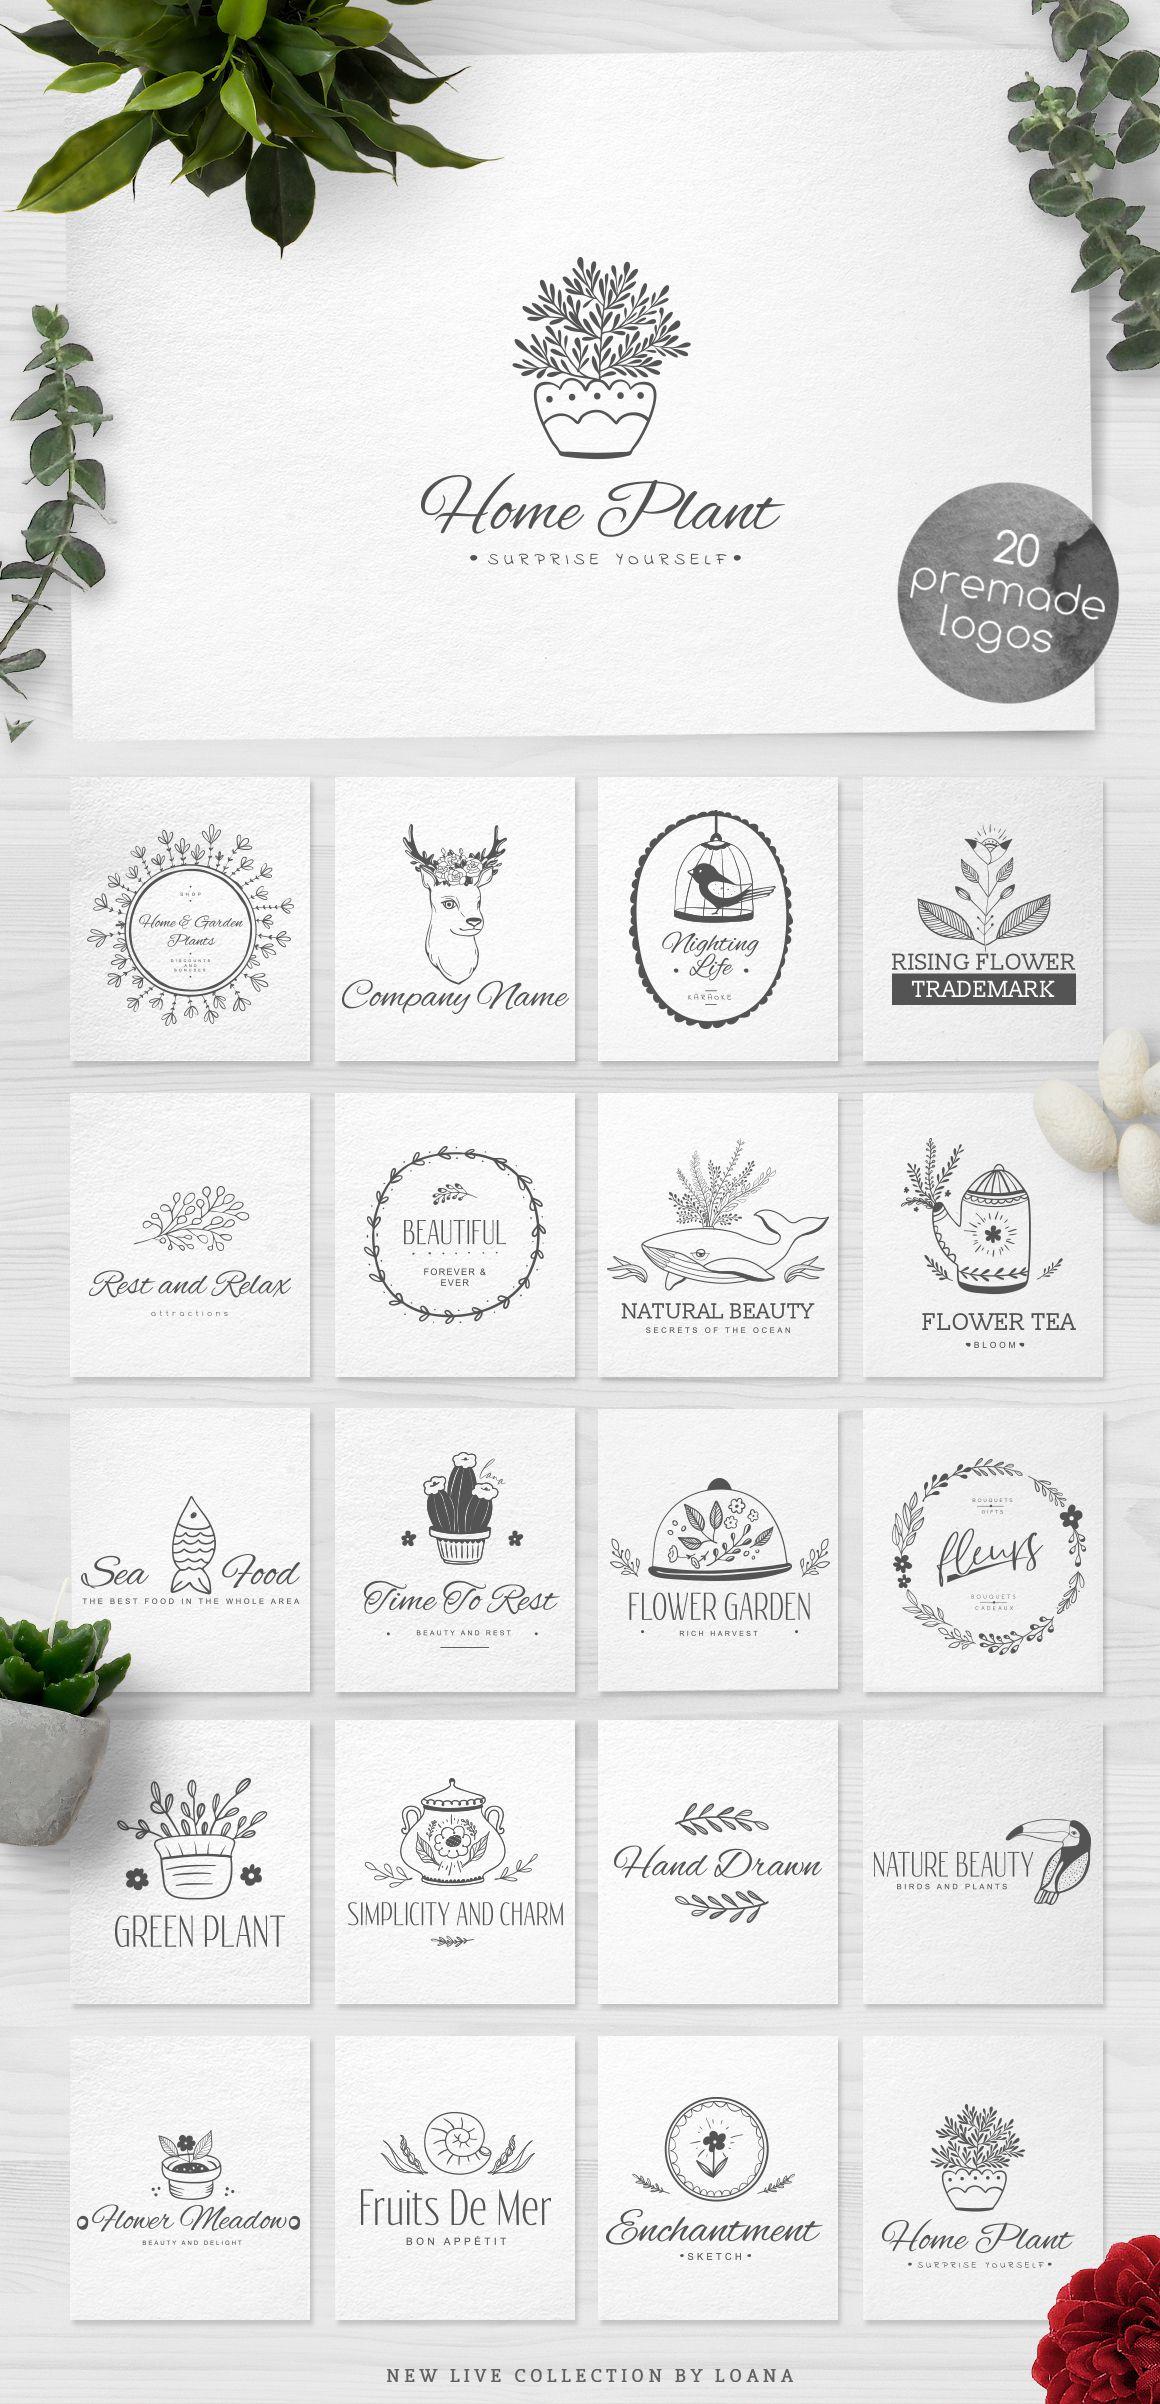 Free Design Bundle by Luba Vega - Xquissive.com exclusive